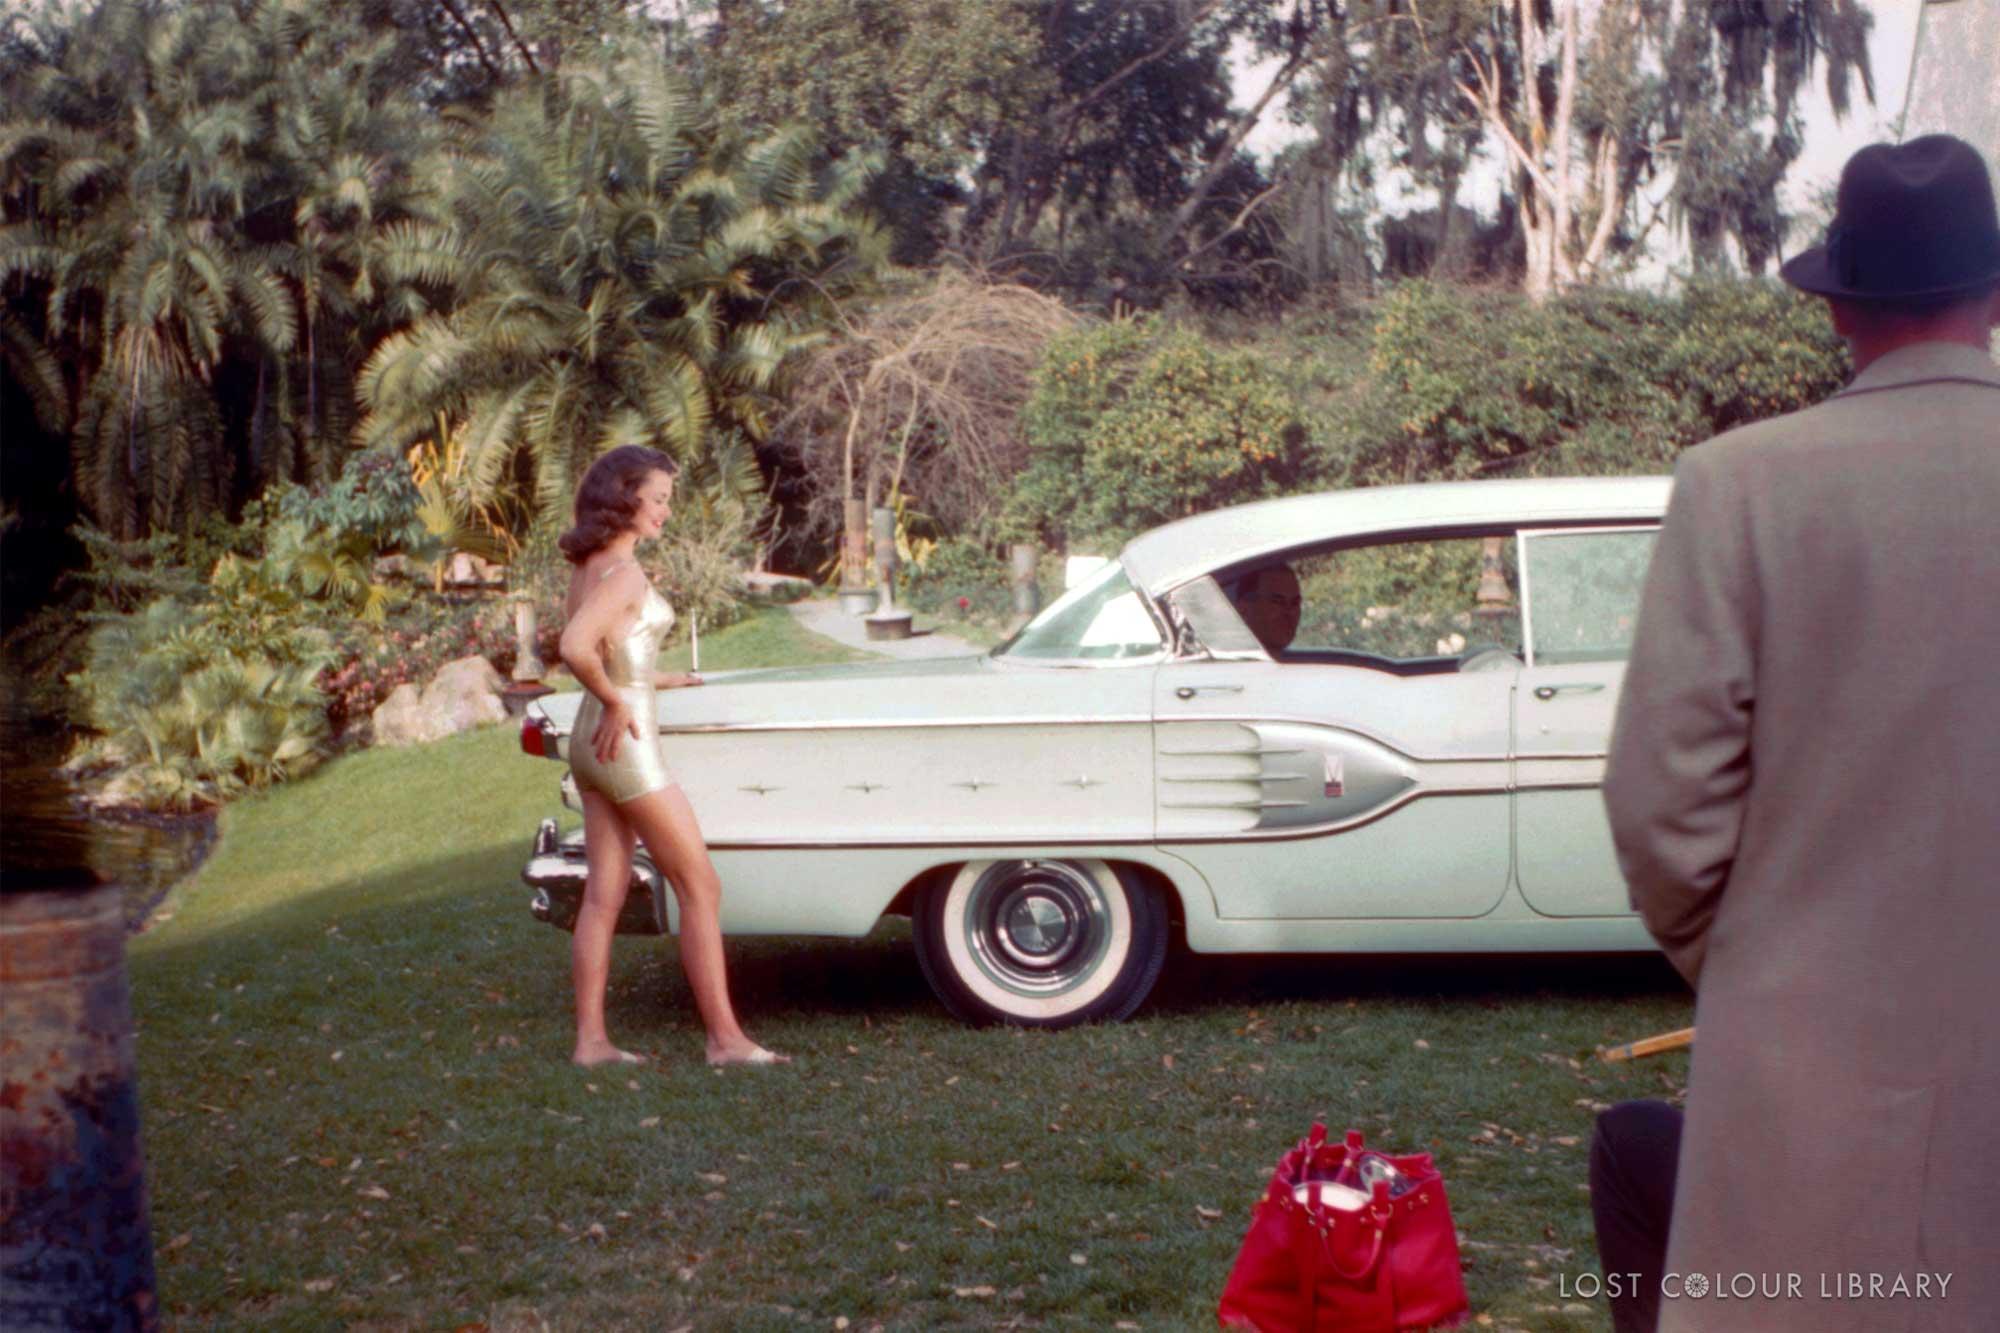 lcl-ww-model-car-shoot-site-wm.jpg